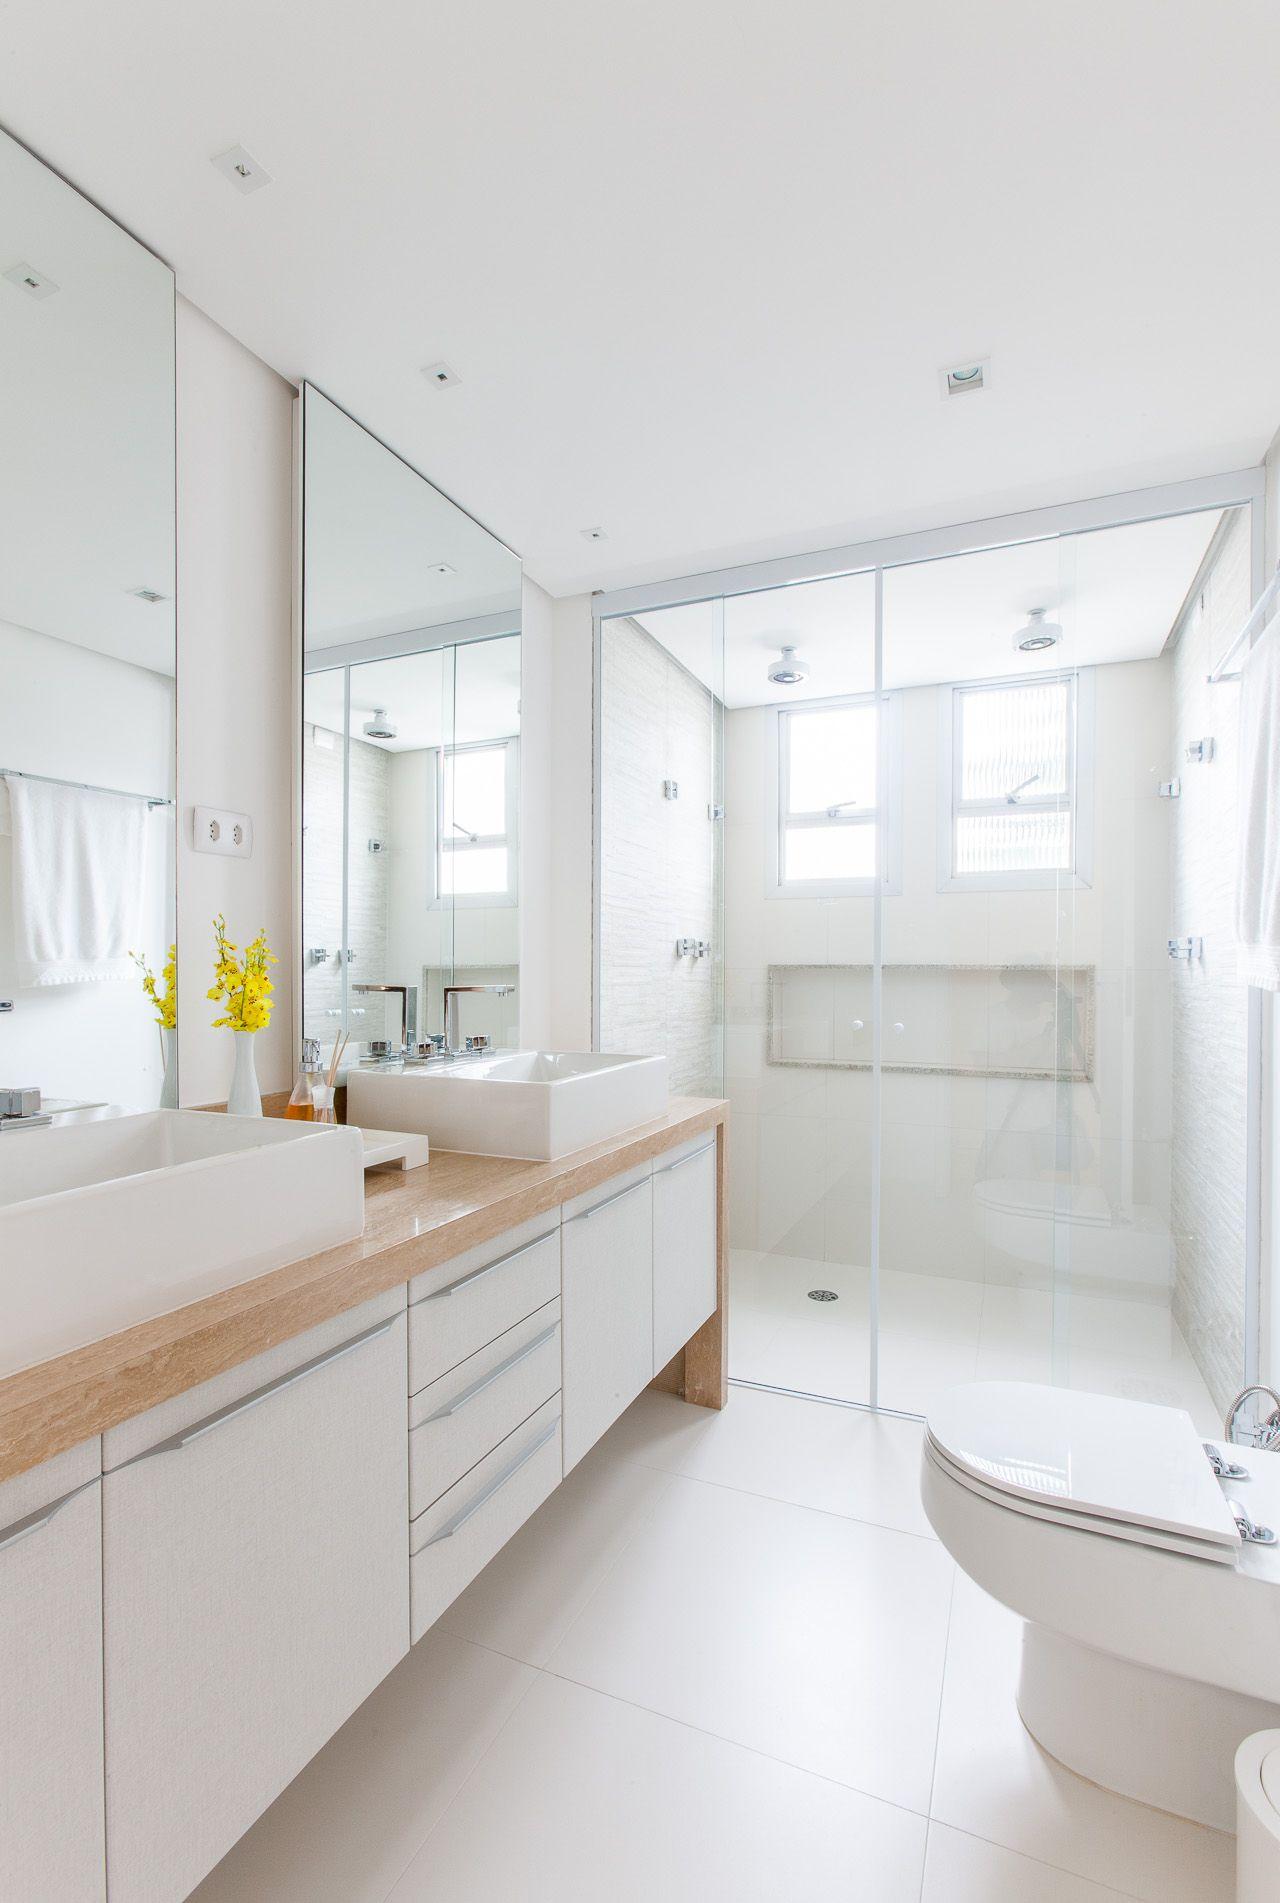 Banheiro casal tudo duplo, moderno e clean | Projeto by Dani Momoi Arquiteta